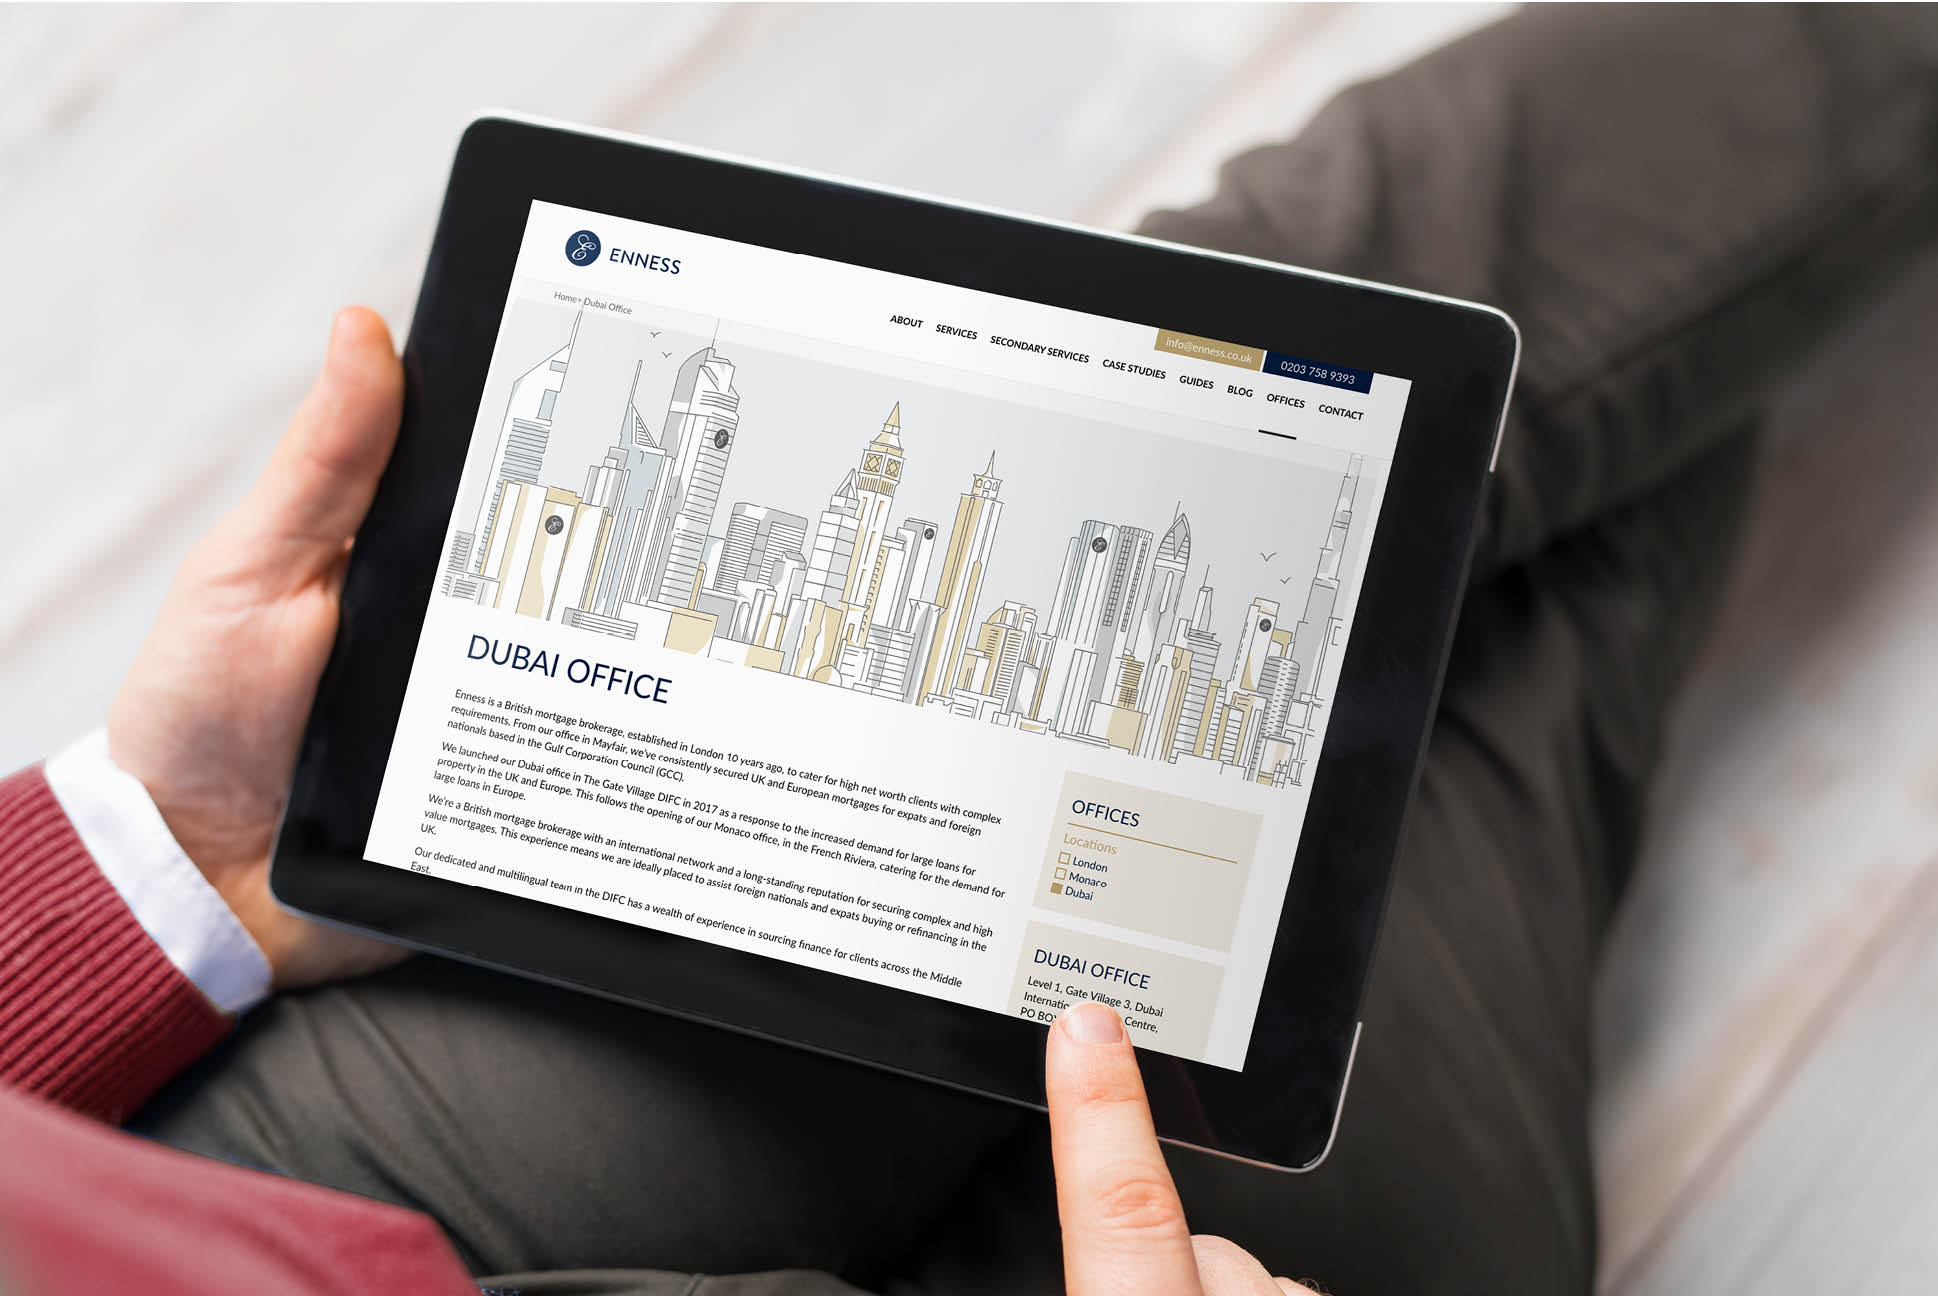 Enness website